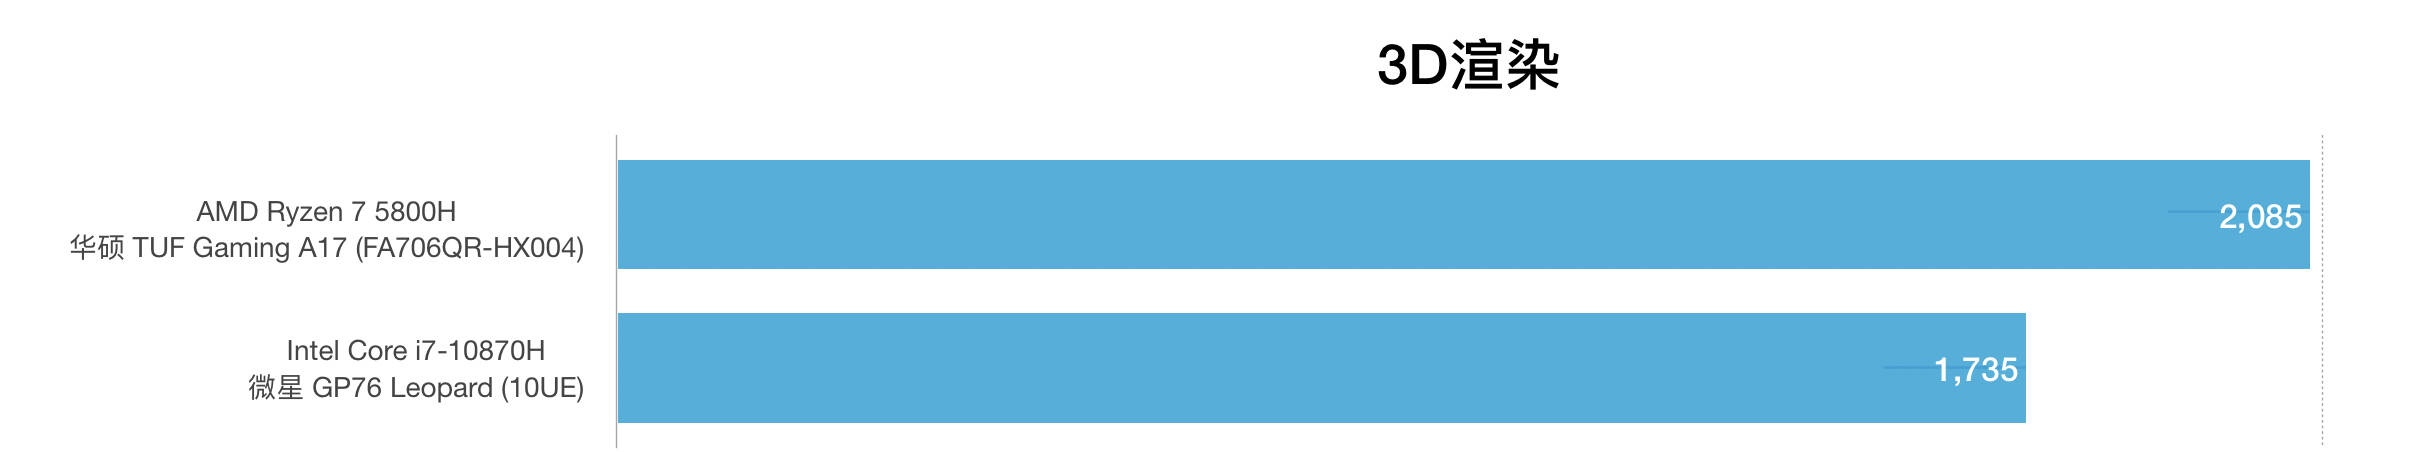 AMD锐龙R7 5800H和i7-10870H性能跑分对比评测